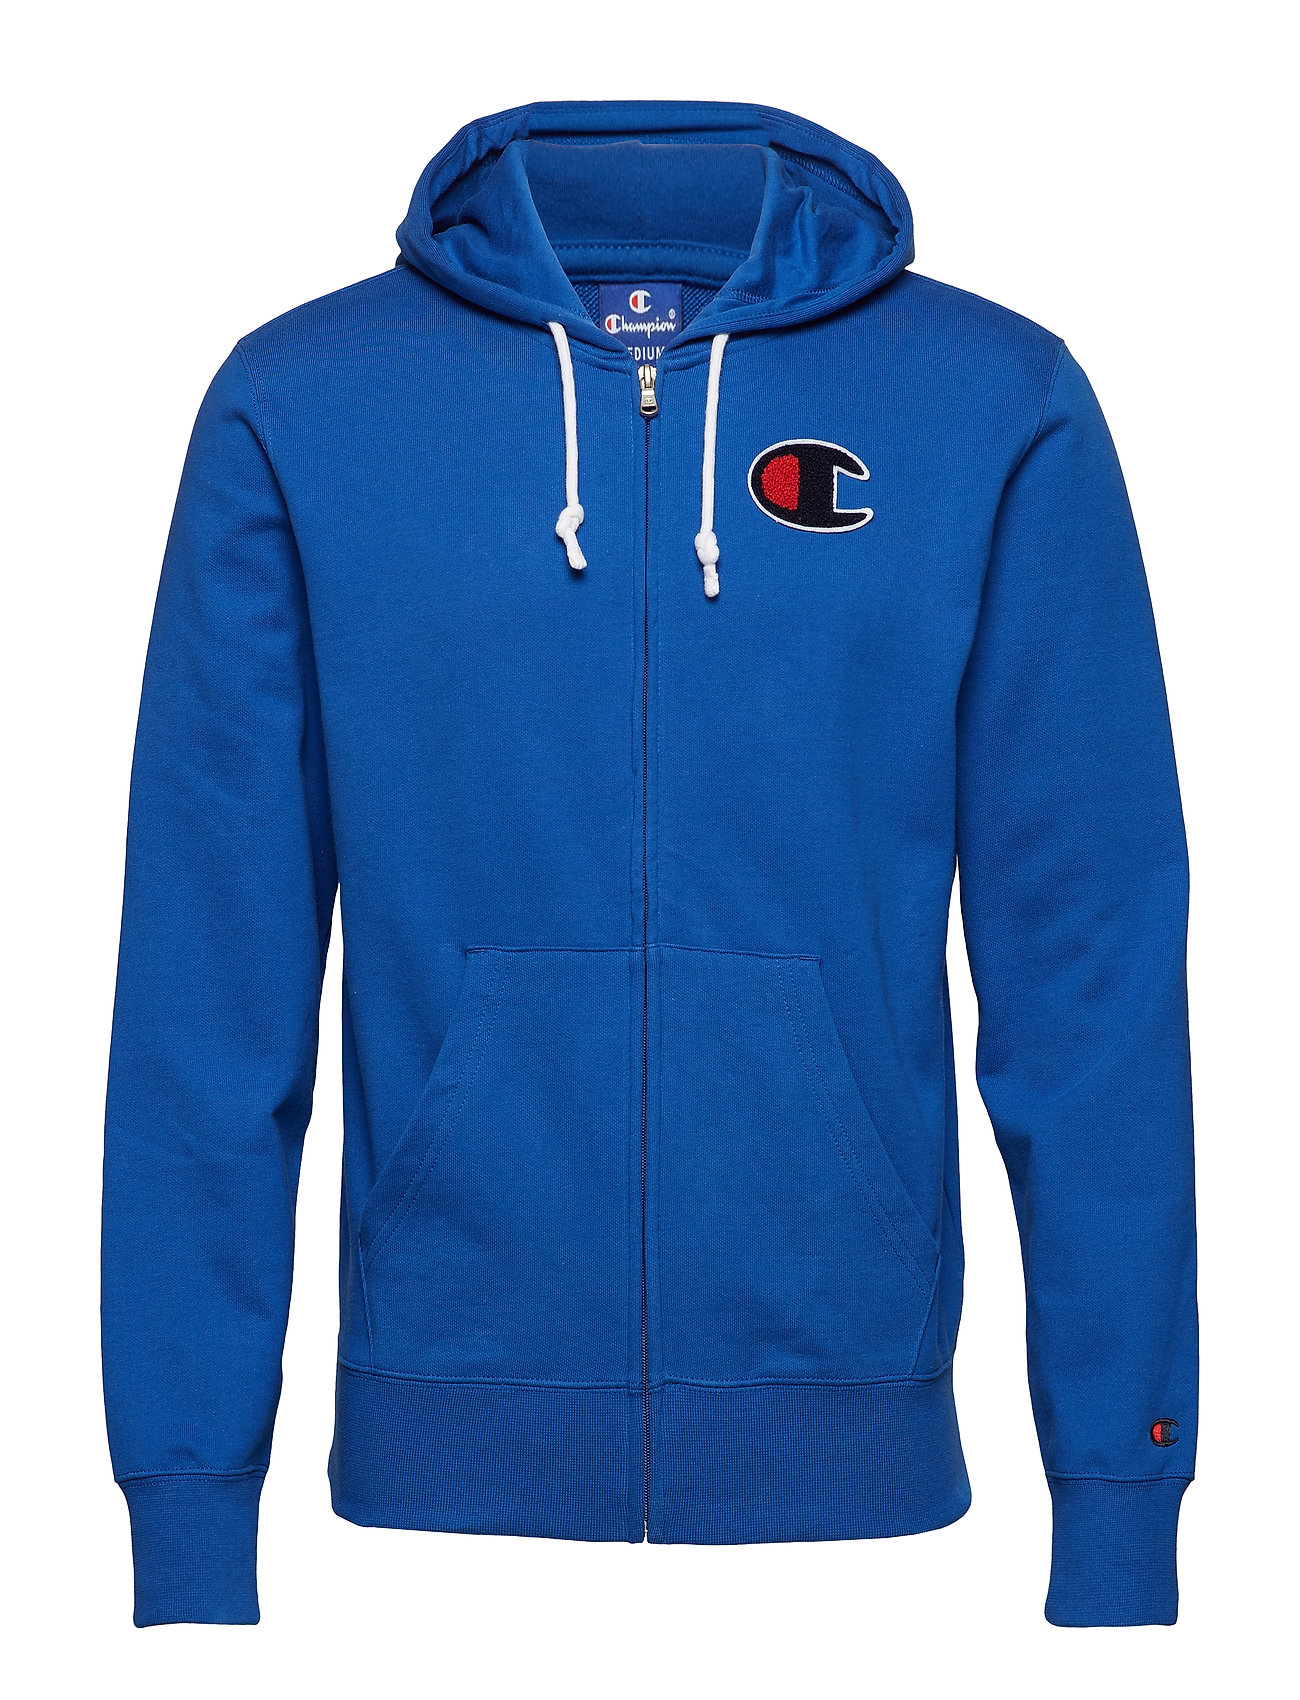 Champion Rochester Hooded Full Zip Sweatshirt - ROYAL BLUE